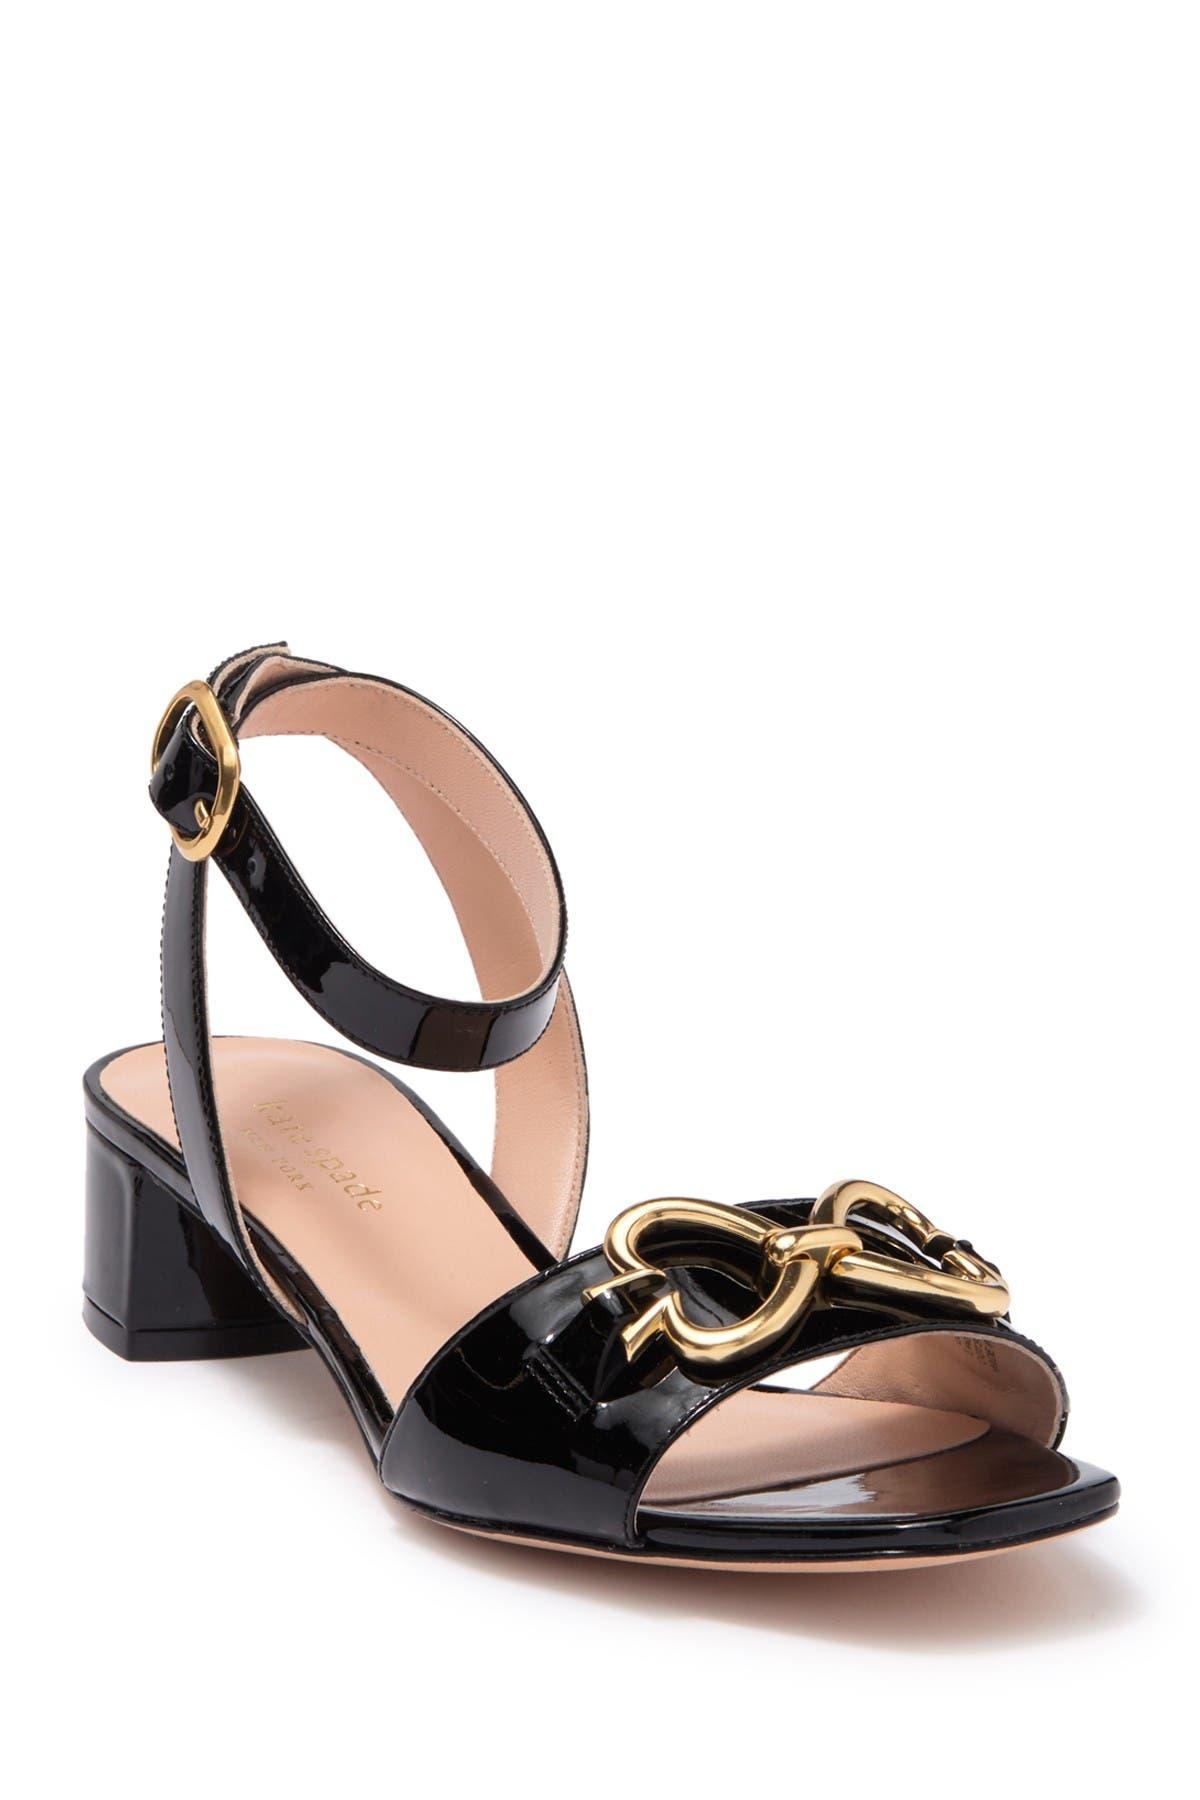 Image of kate spade new york lagoon heart chain sandal